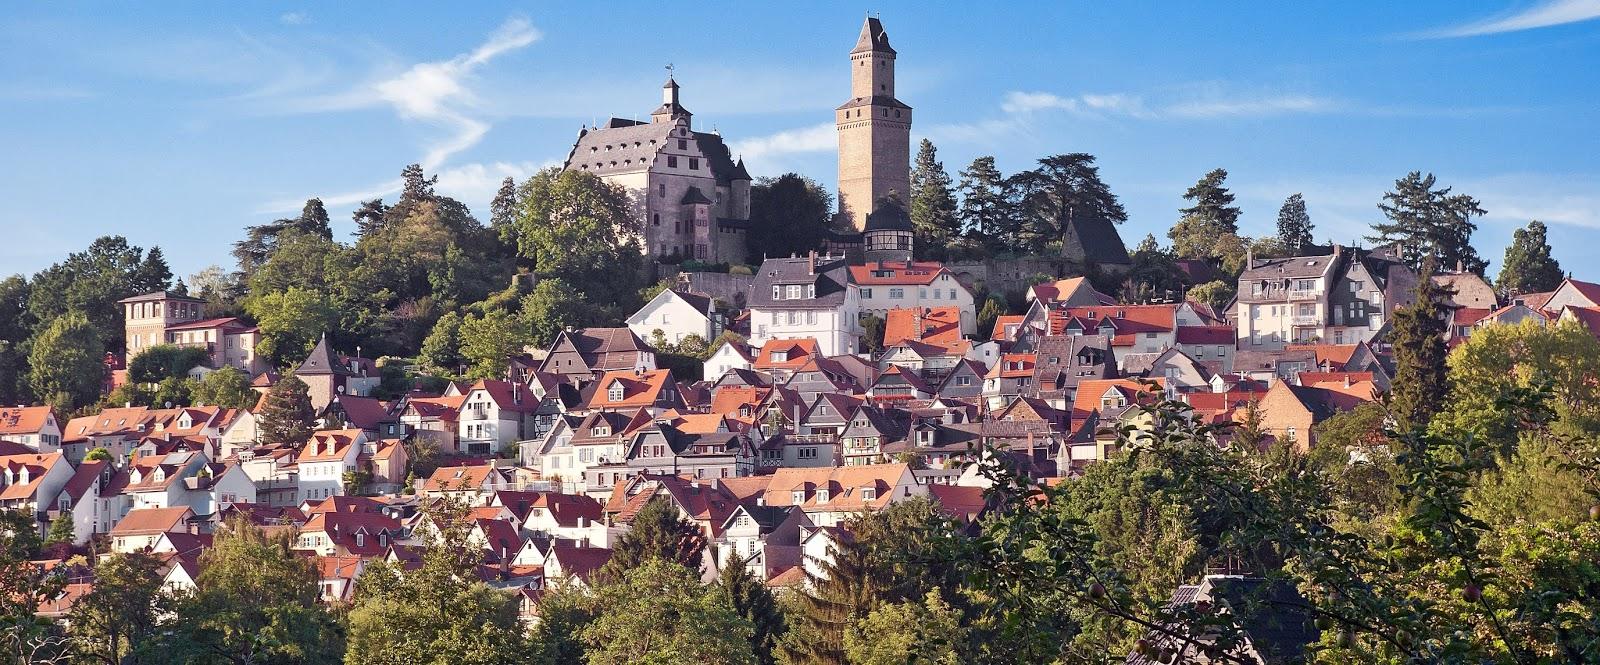 Click on: STUDENT EXCHANGE 2019: KRONBERG IM TAUNUS (GERMANY)